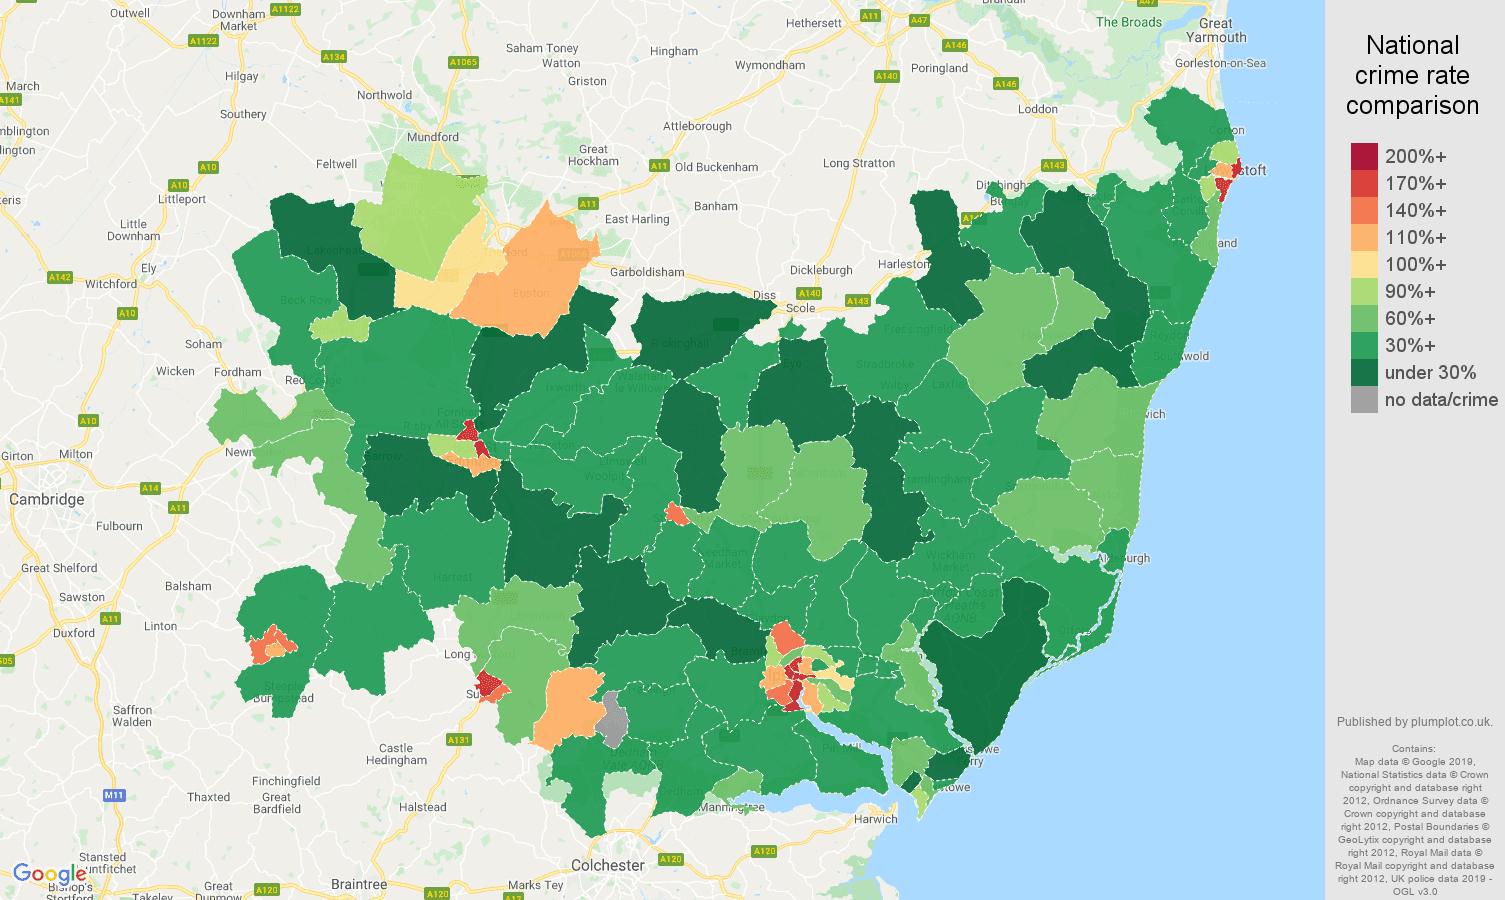 Suffolk public order crime rate comparison map